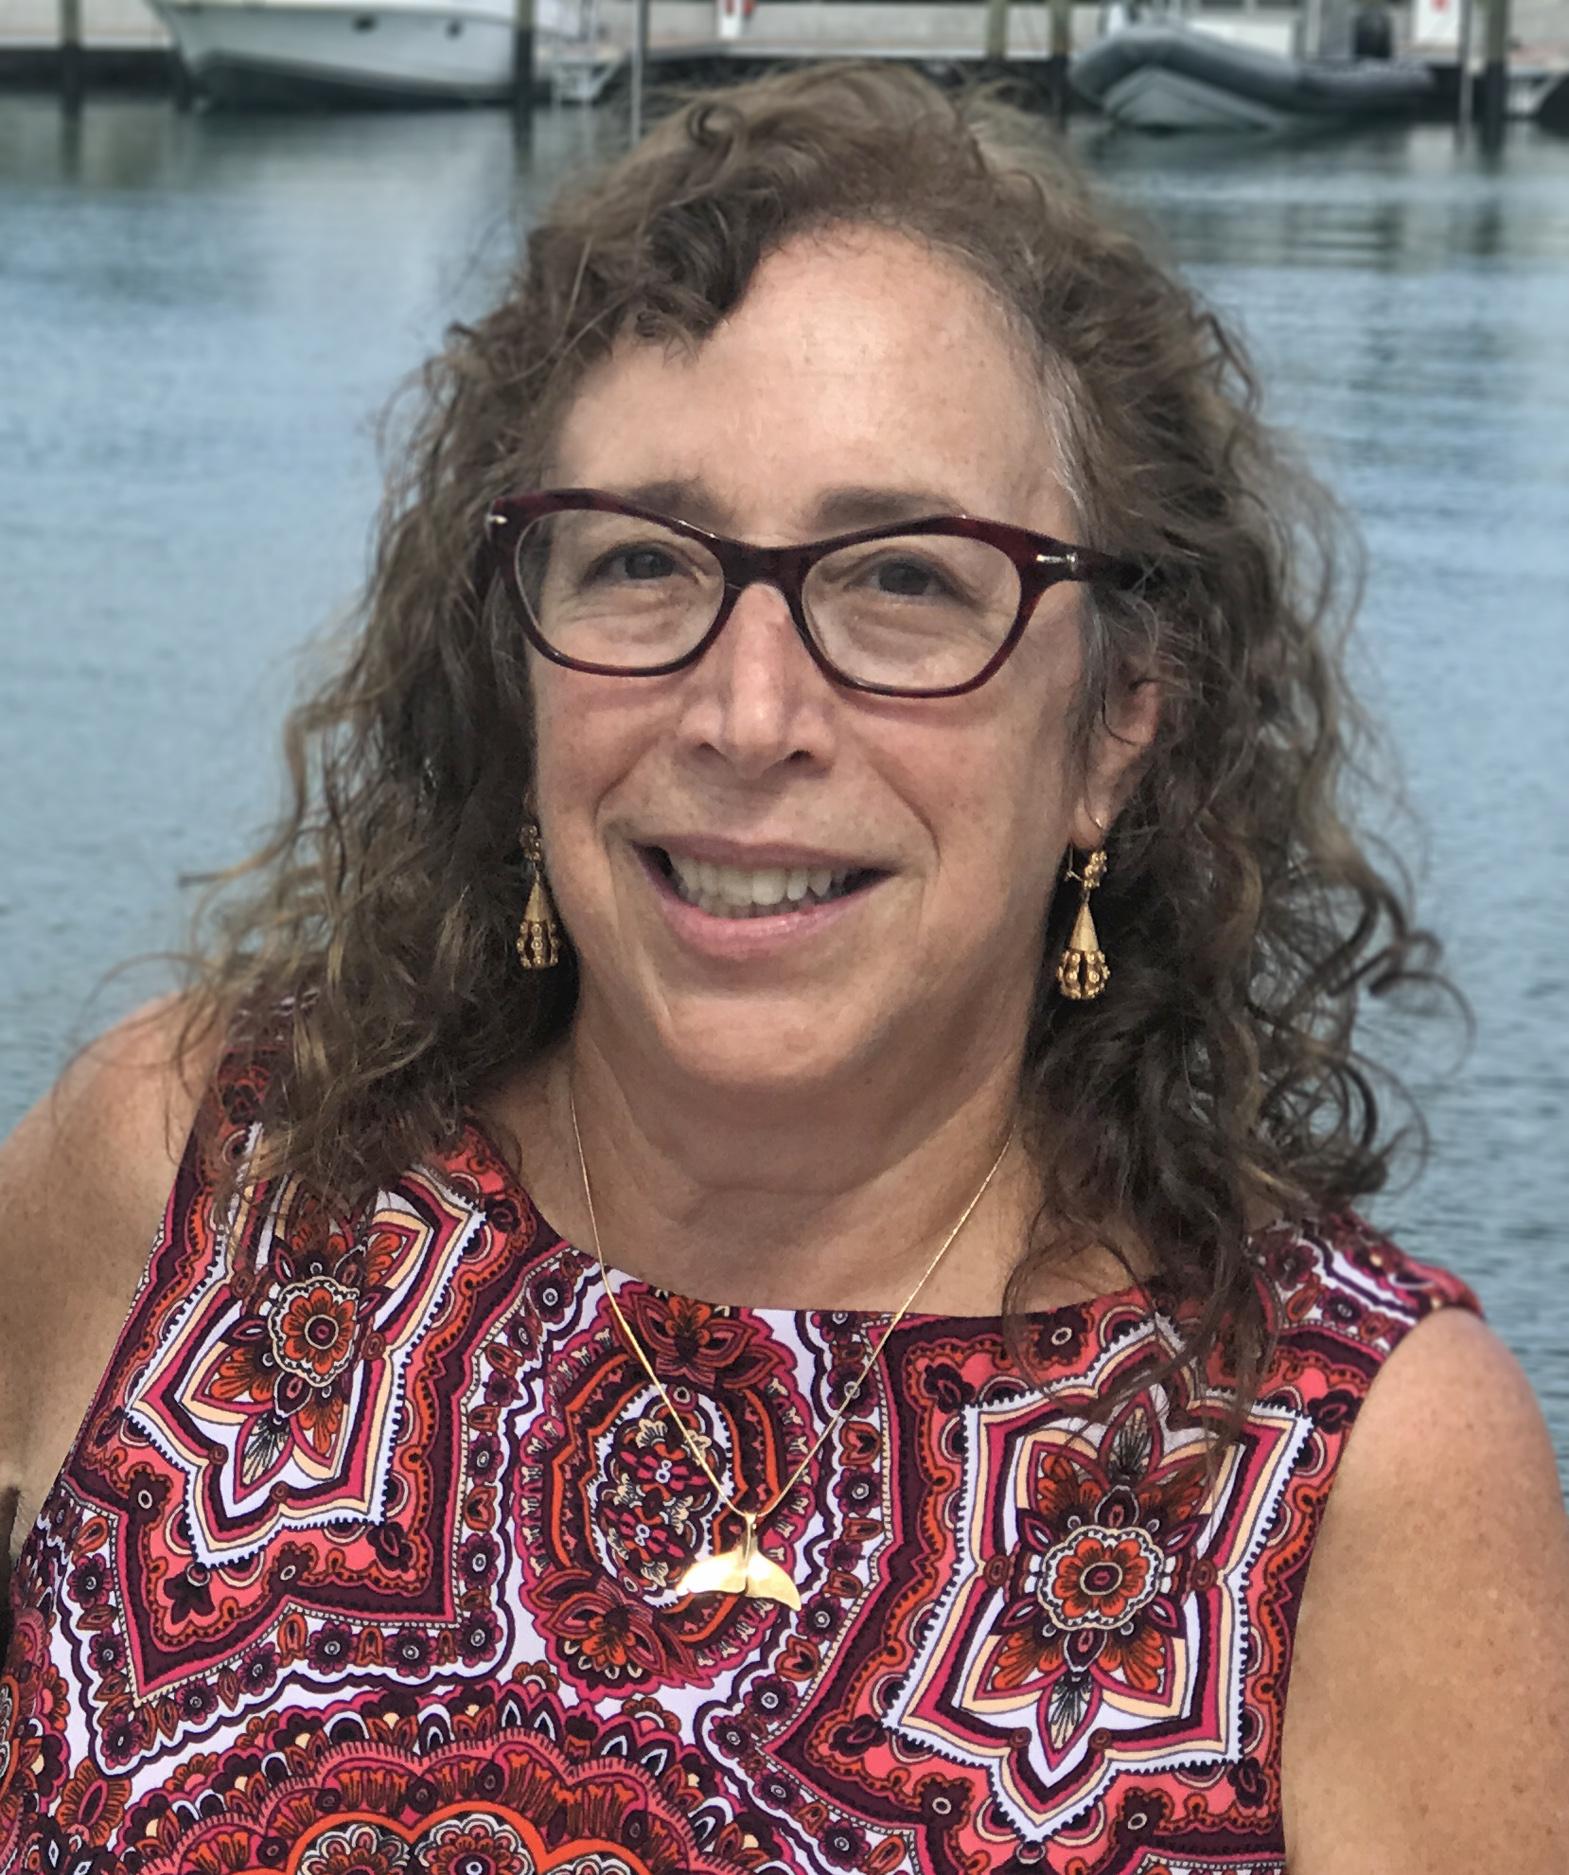 Rita Irwin to continue leading Florida Keys Tourism Board